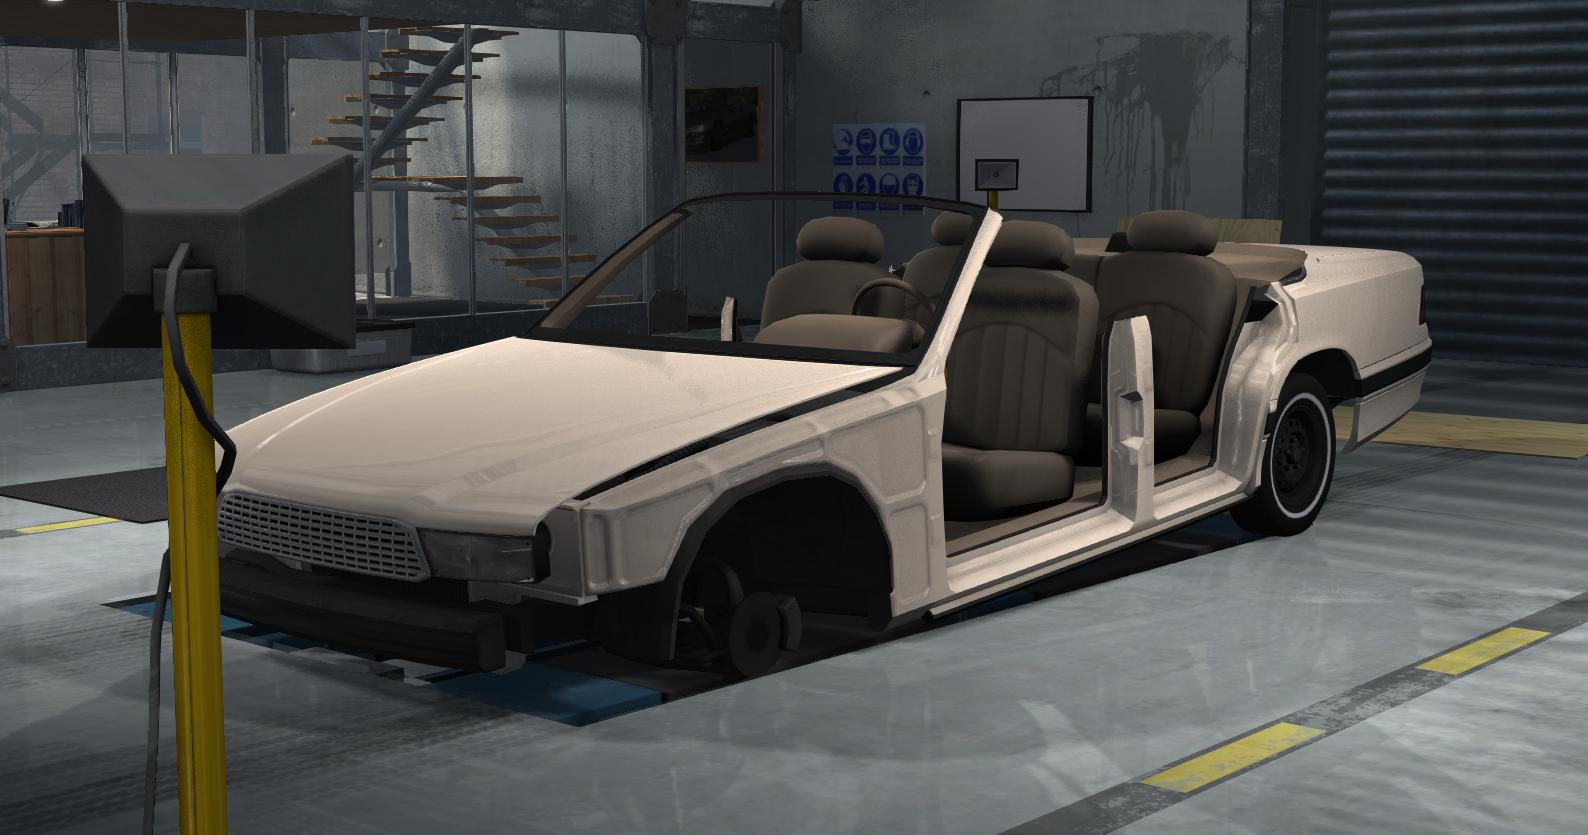 Wip gavril grand marshal cabriolet beamng screenshot00106g sciox Choice Image